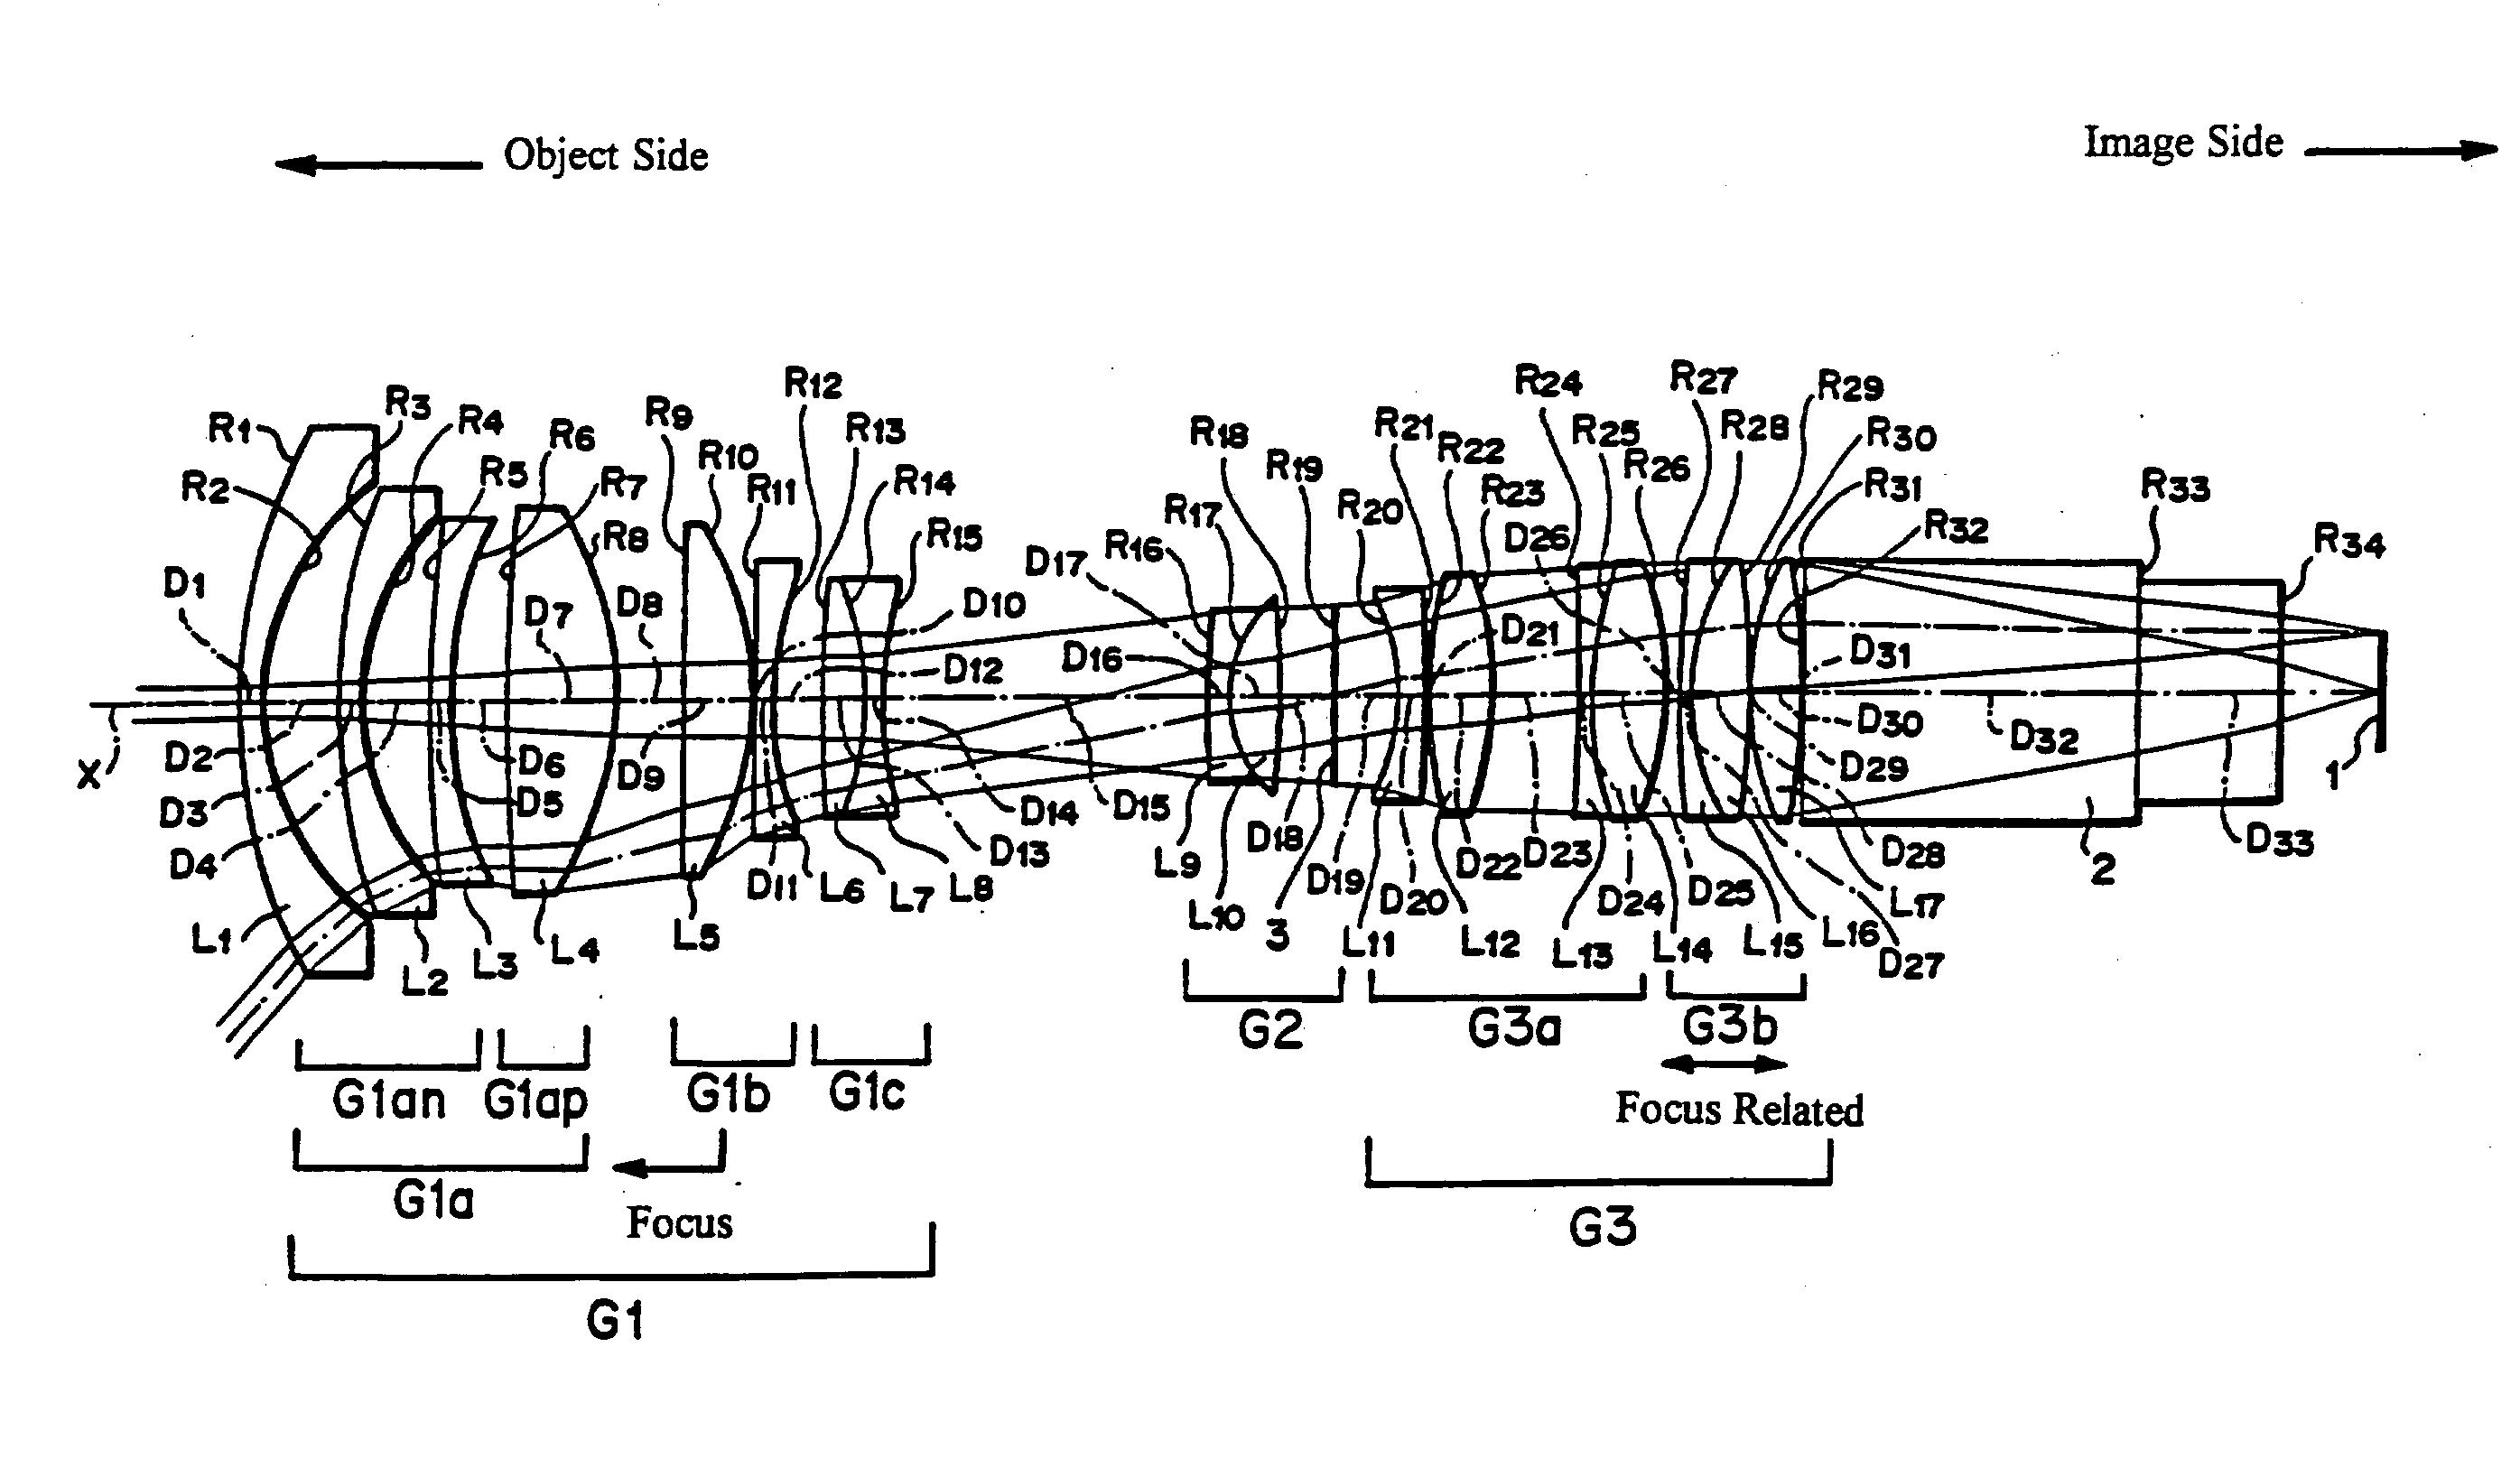 Amazing kia sportage wiring diagram composition everything you luxury 99 kia sportage wiring diagram elaboration wiring diagram asfbconference2016 Choice Image